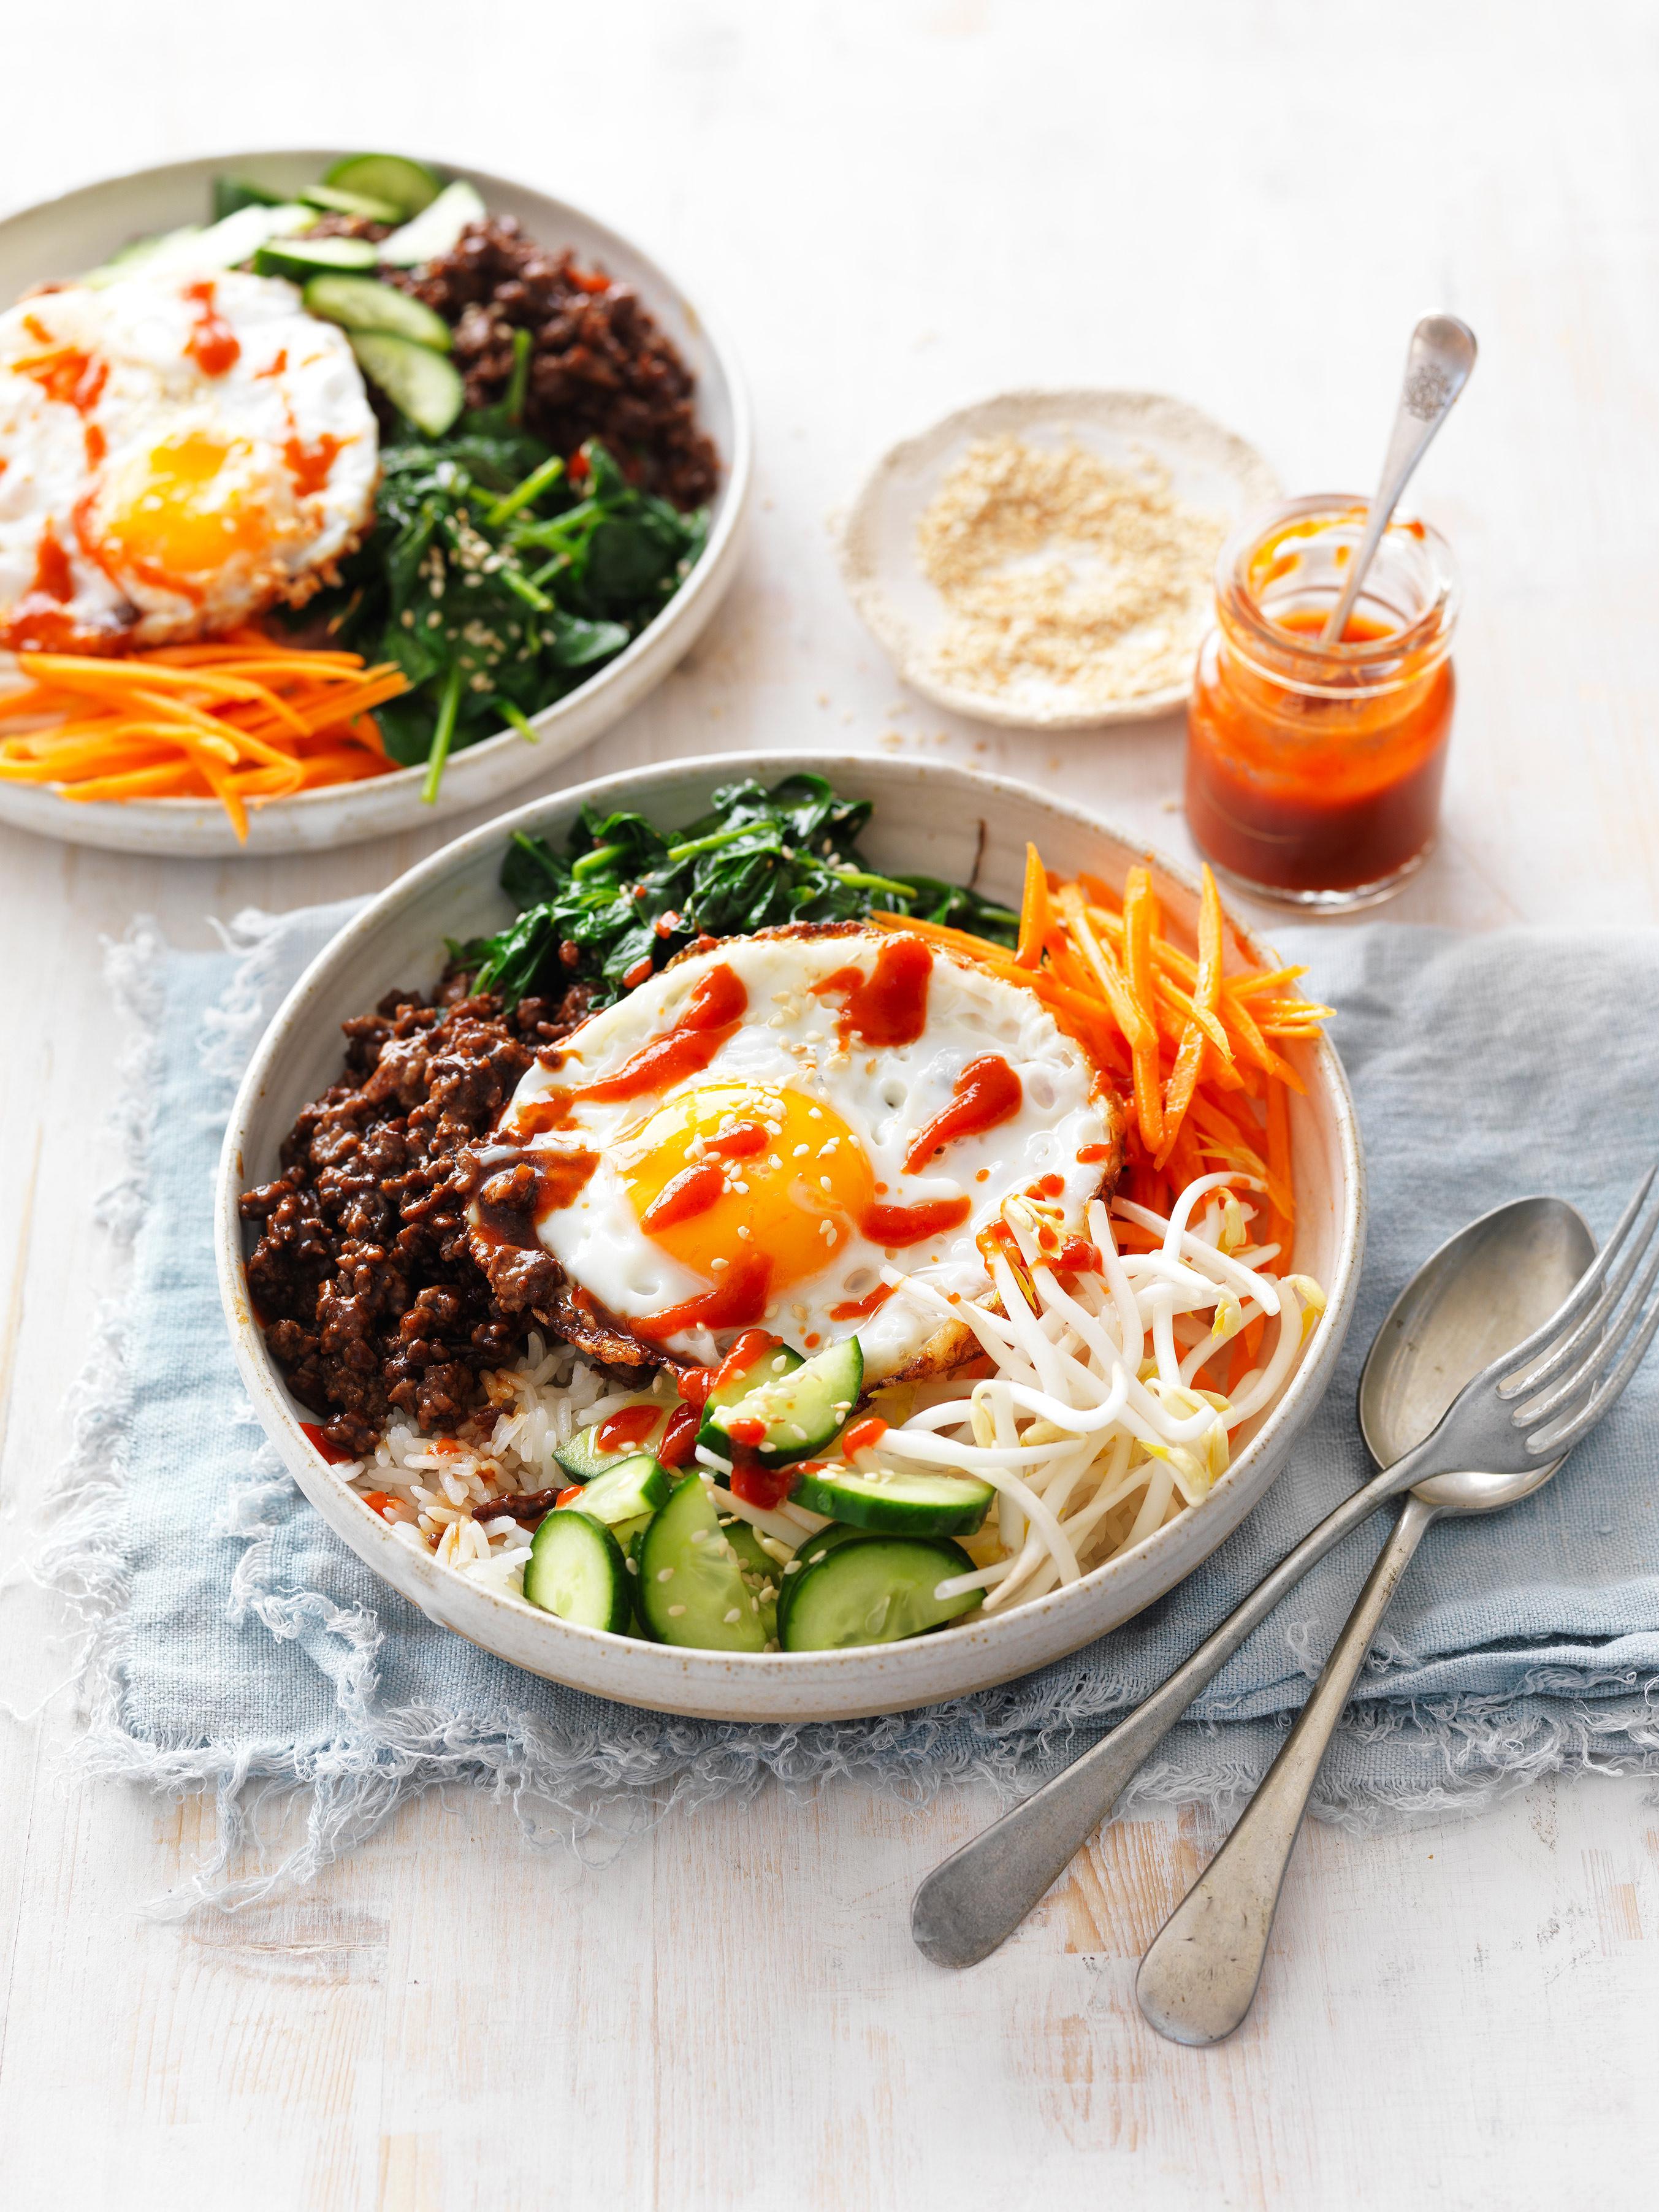 Hello fresh dinner with this easy Korean Beef Bibimbap recipe